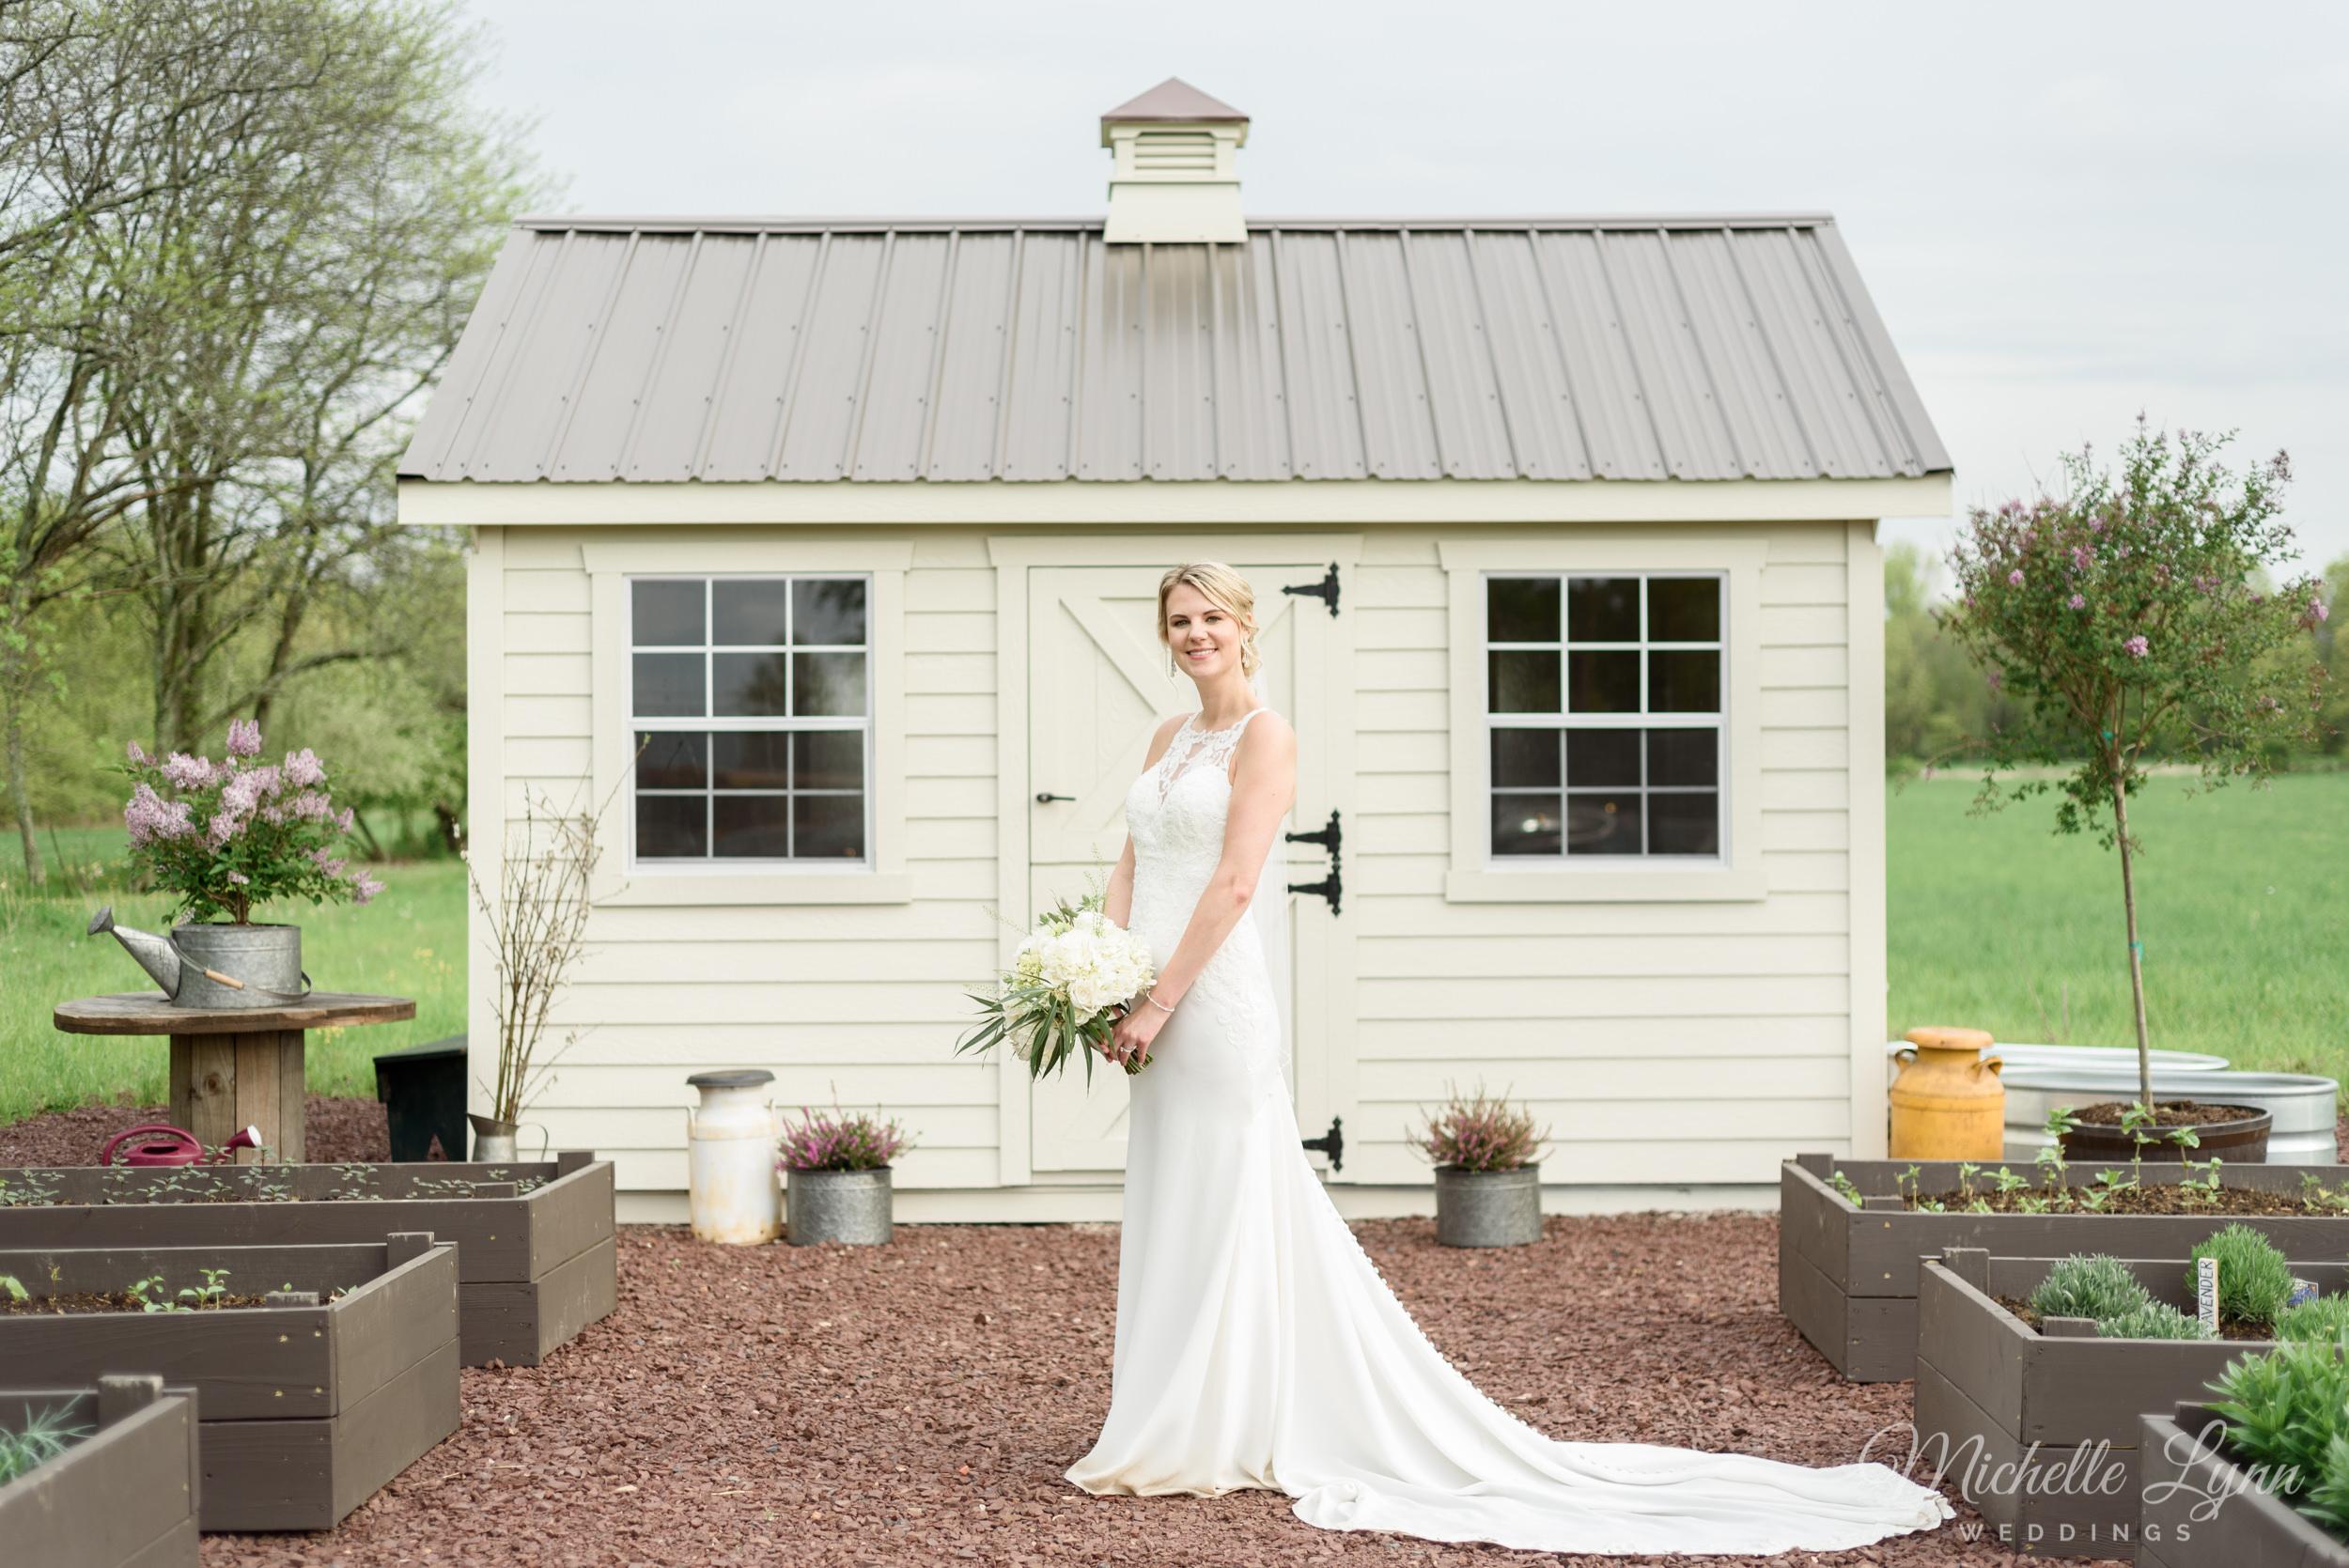 mlw-the-farm-bakery-and-events-wedding-photos-21.jpg